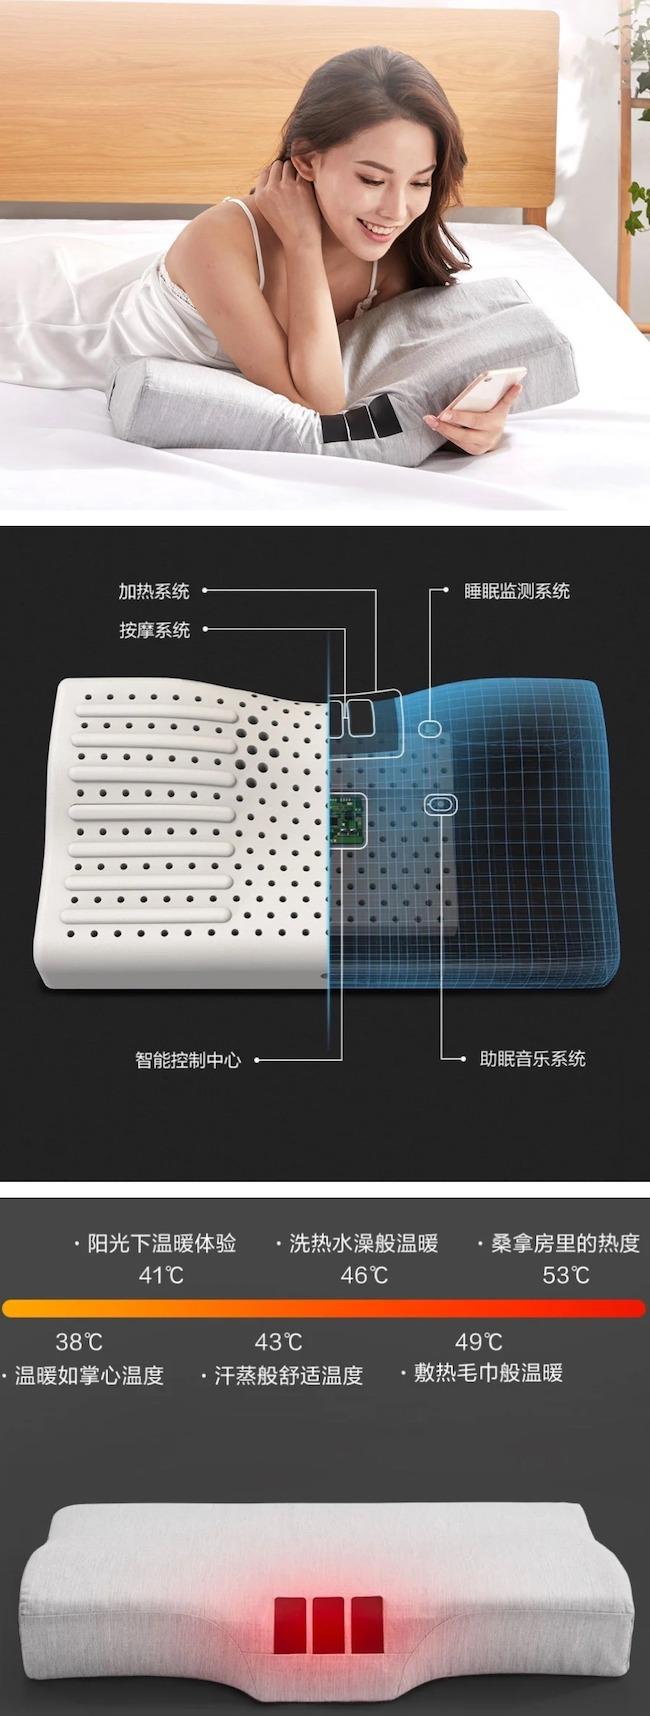 Xiaomi разработала «умную» подушку с подогревом, массажем и стереодинамиками